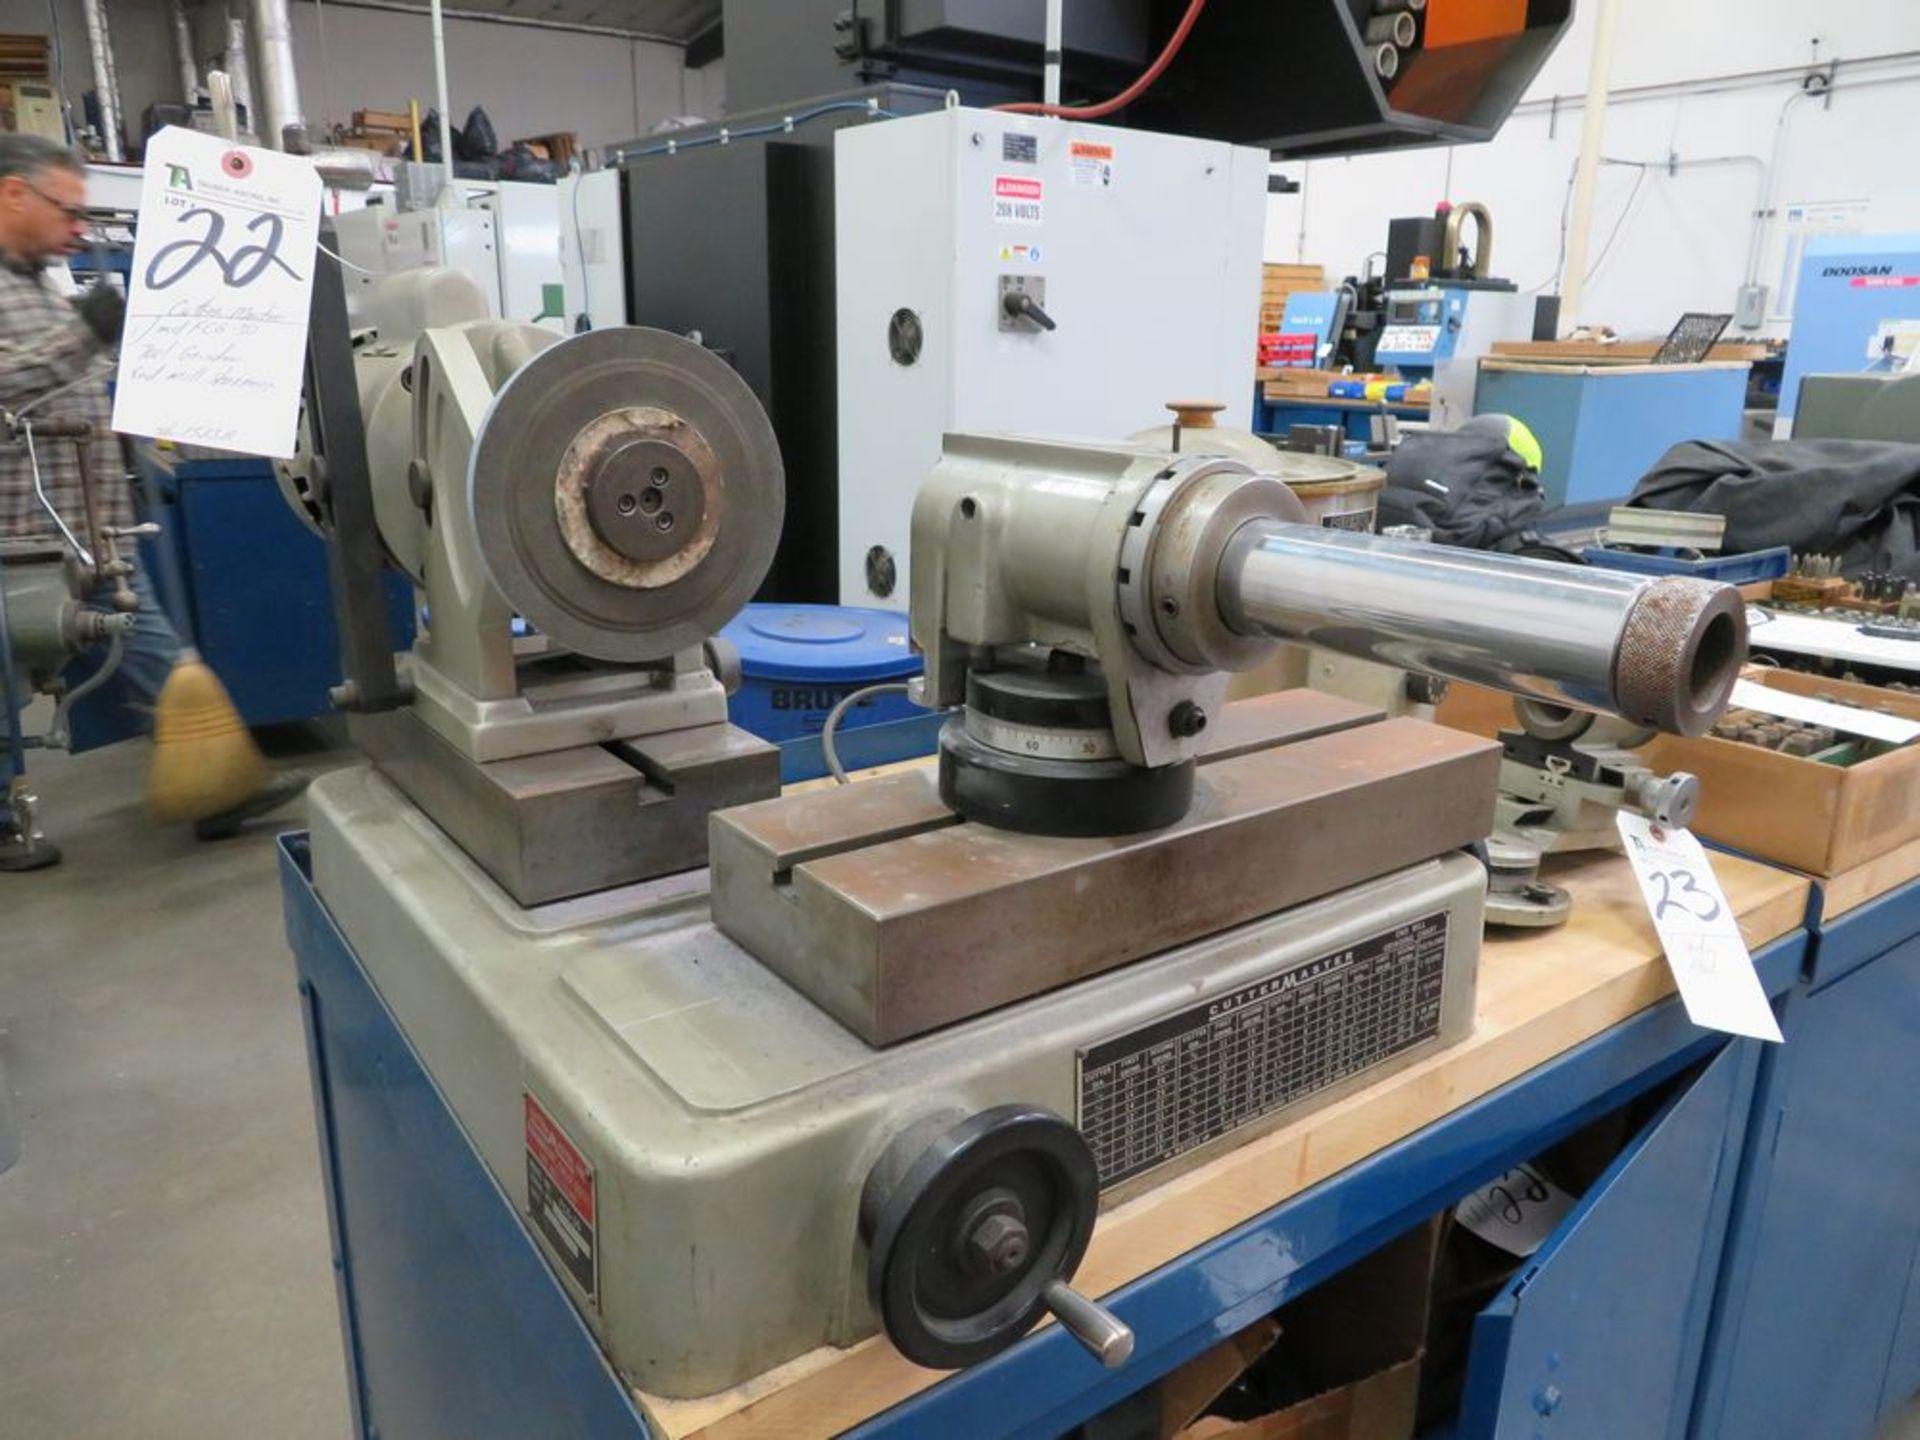 Lot 22 - Cutter Master mod. FCG-30, Tool Grinder End Mill Sharpener; S/N 1523B